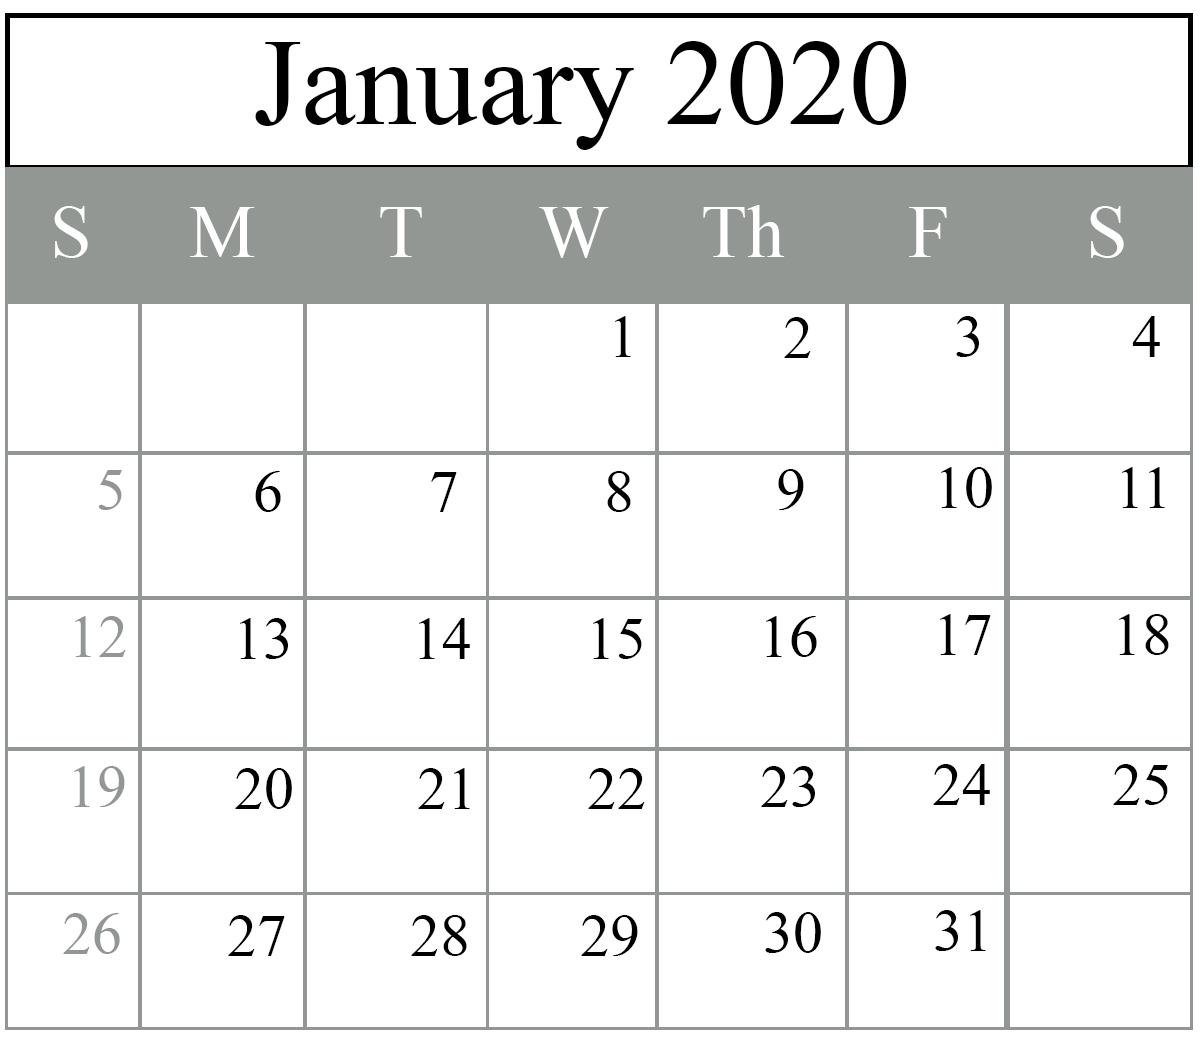 Free Blank January 2020 Calendar Printable In Pdf, Word-Wiki Calendar January 2020